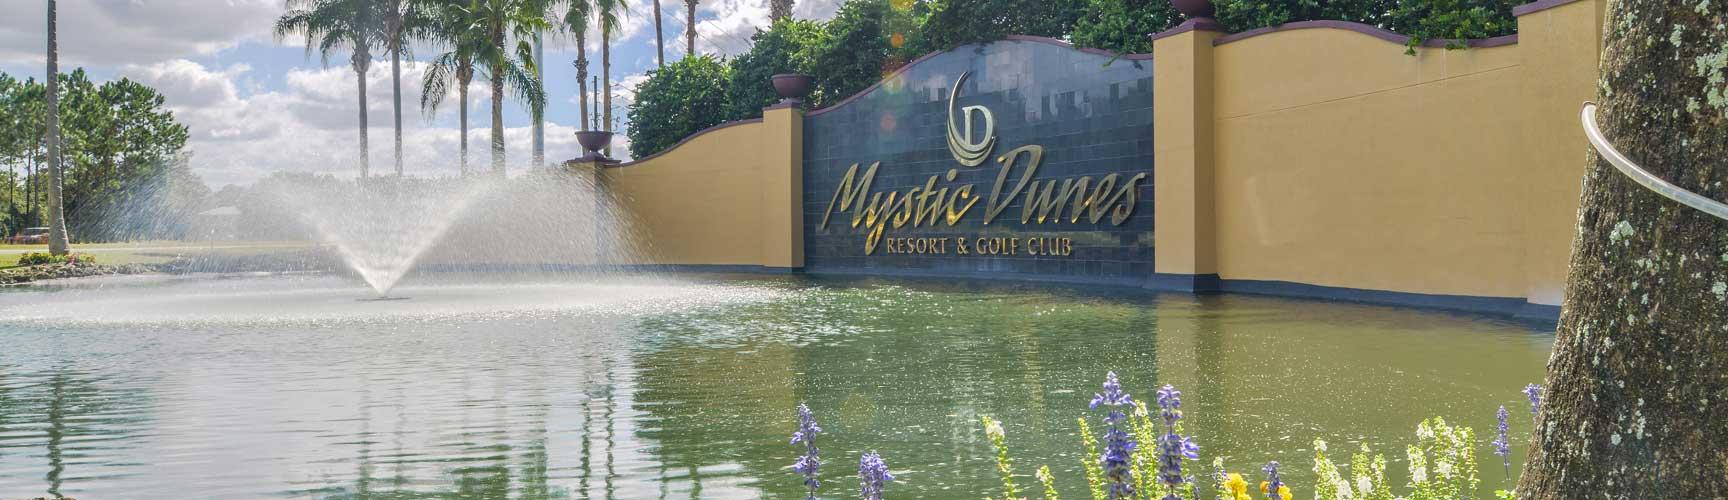 Budget and family friendly Mystic Dunes Resort & Golf Club near Walt Disney World.